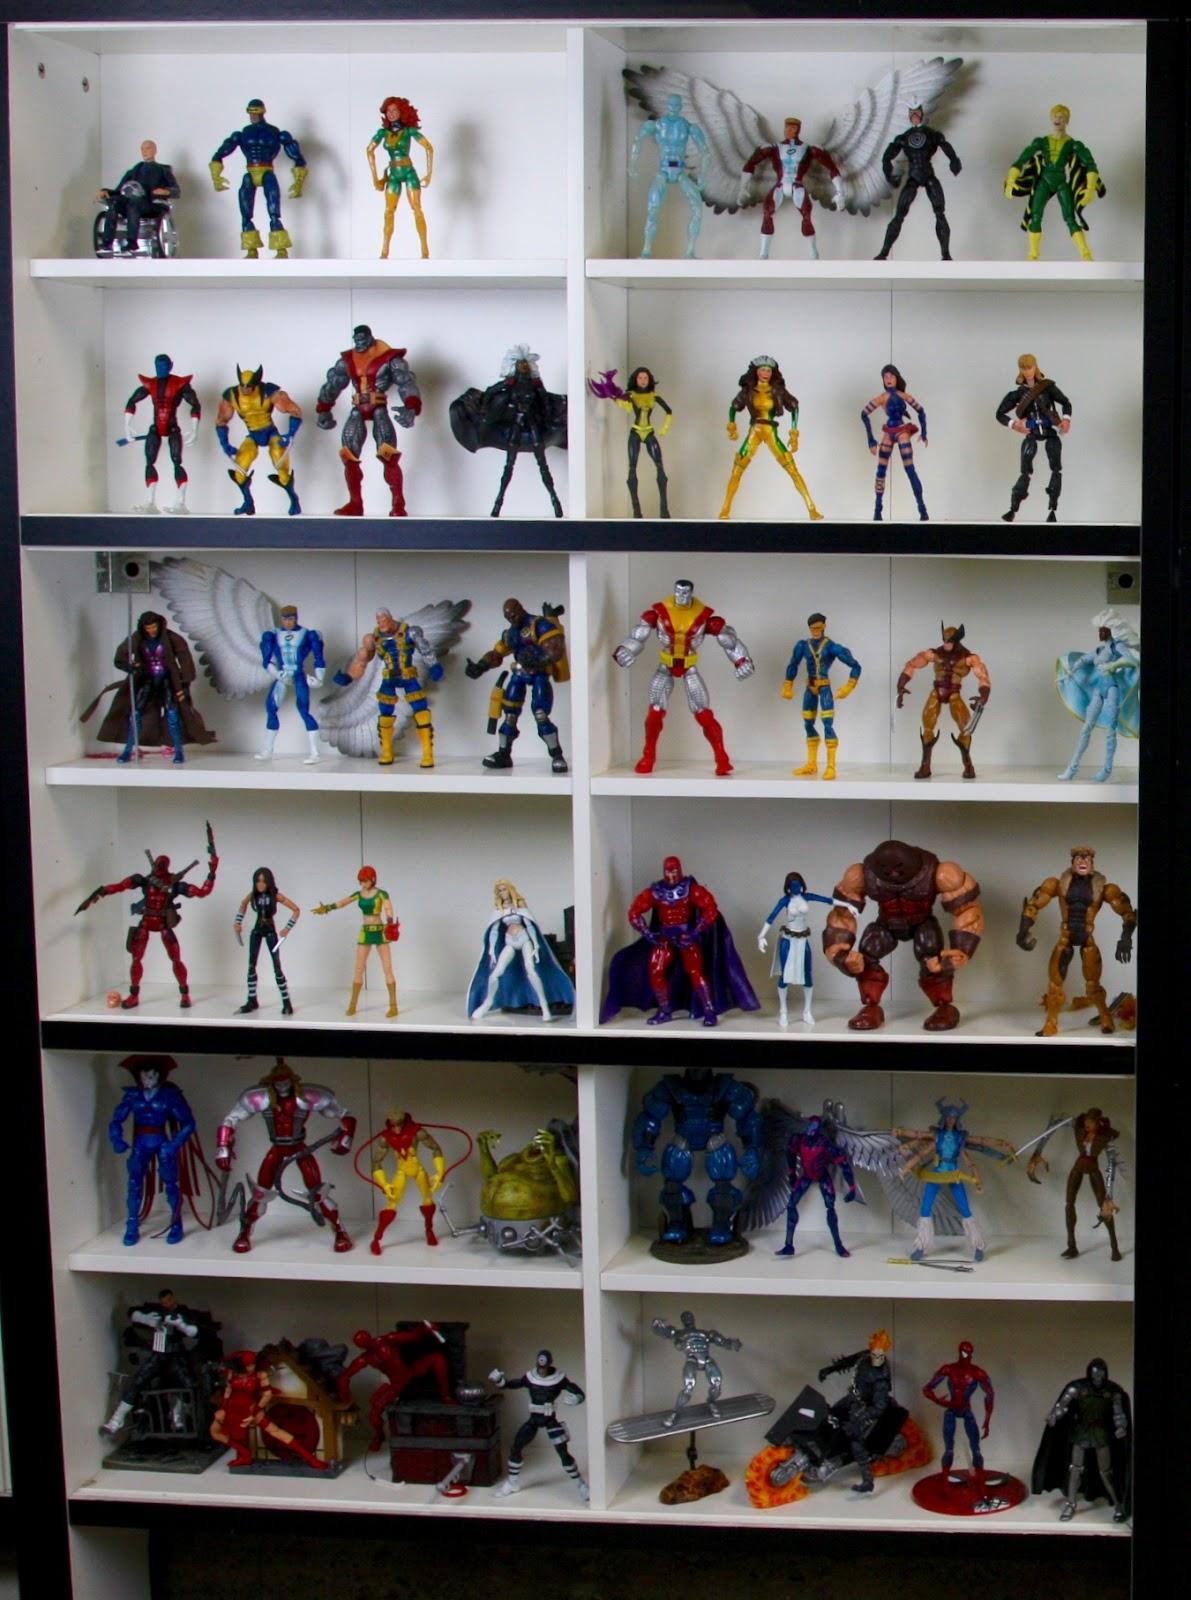 Geek Diy Bam Marvel Legends Action Figures Display Case Diy